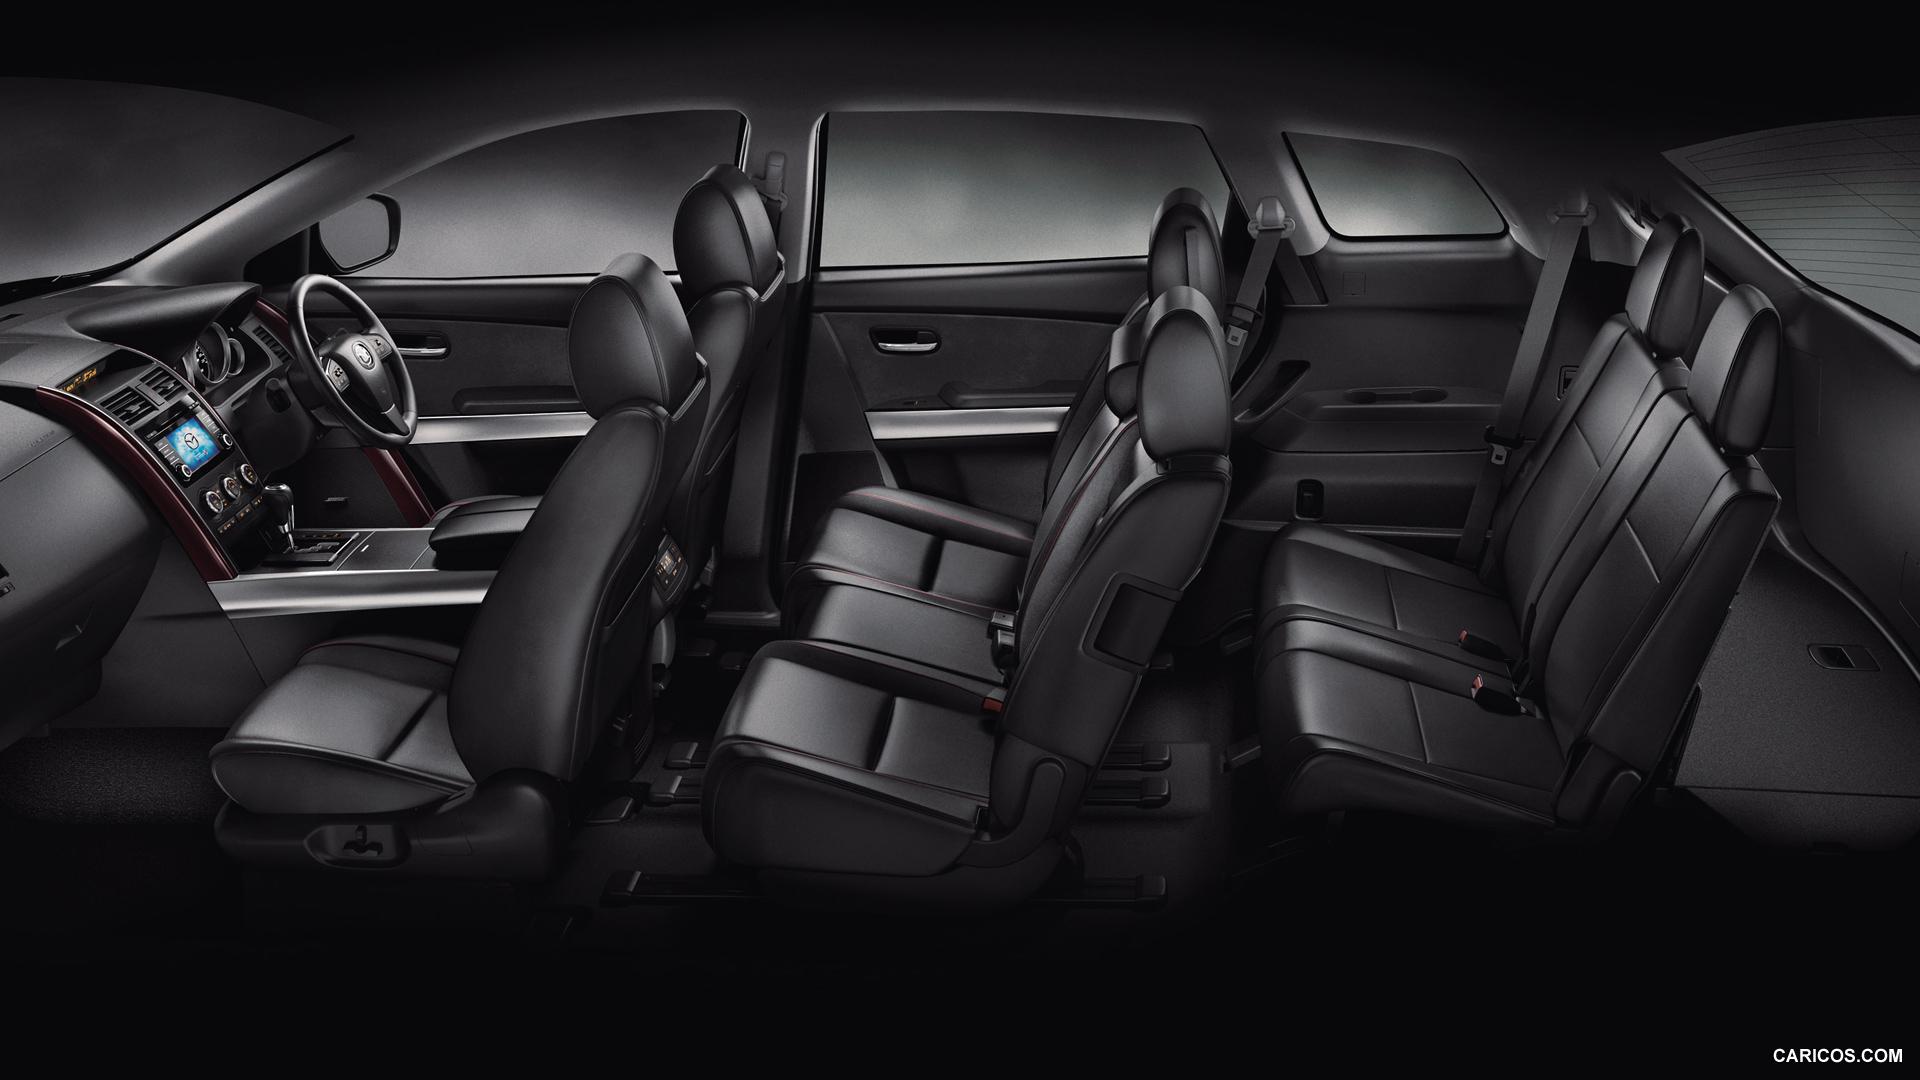 2013 Mazda Cx 9 Information And Photos Zombiedrive